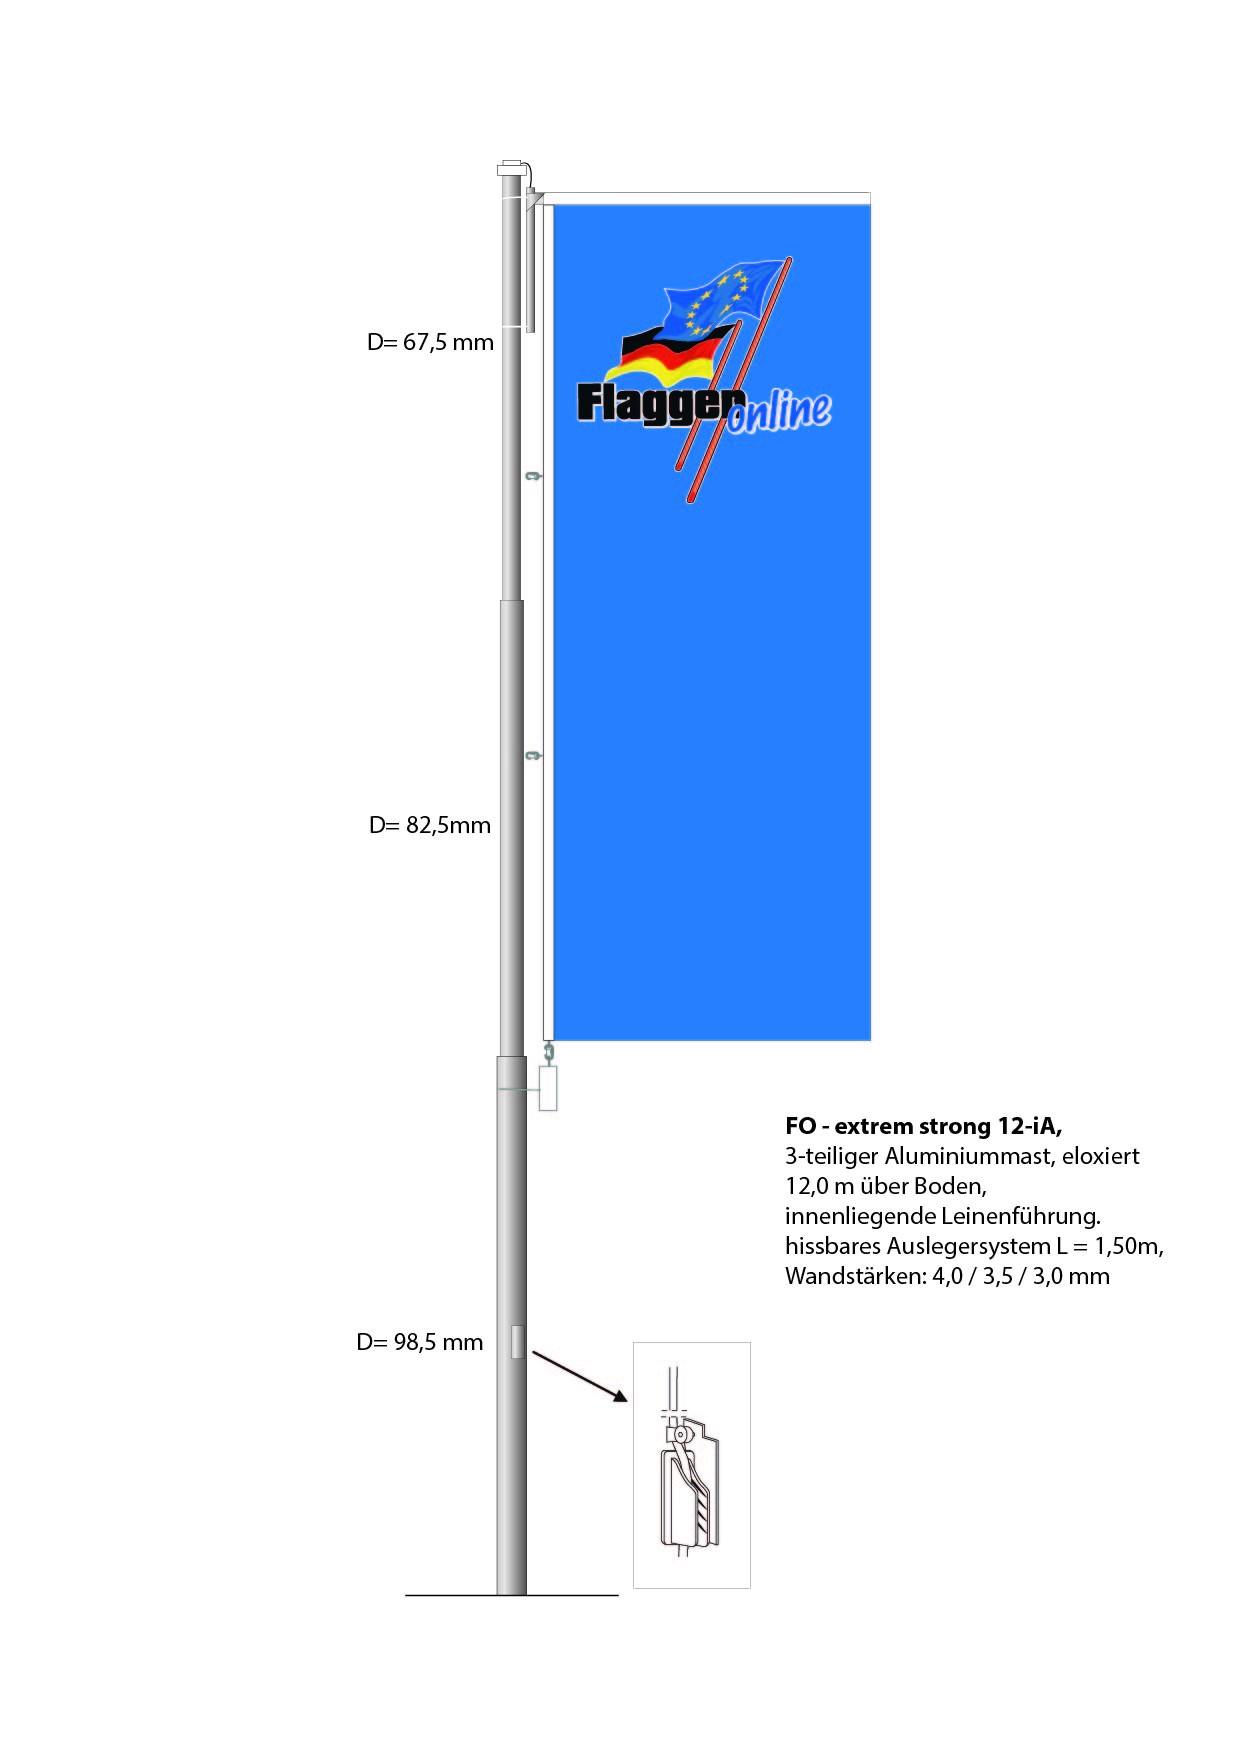 Aluminium Flaggenmast FO-Extra Strong 12iA, 12 Meter über Boden